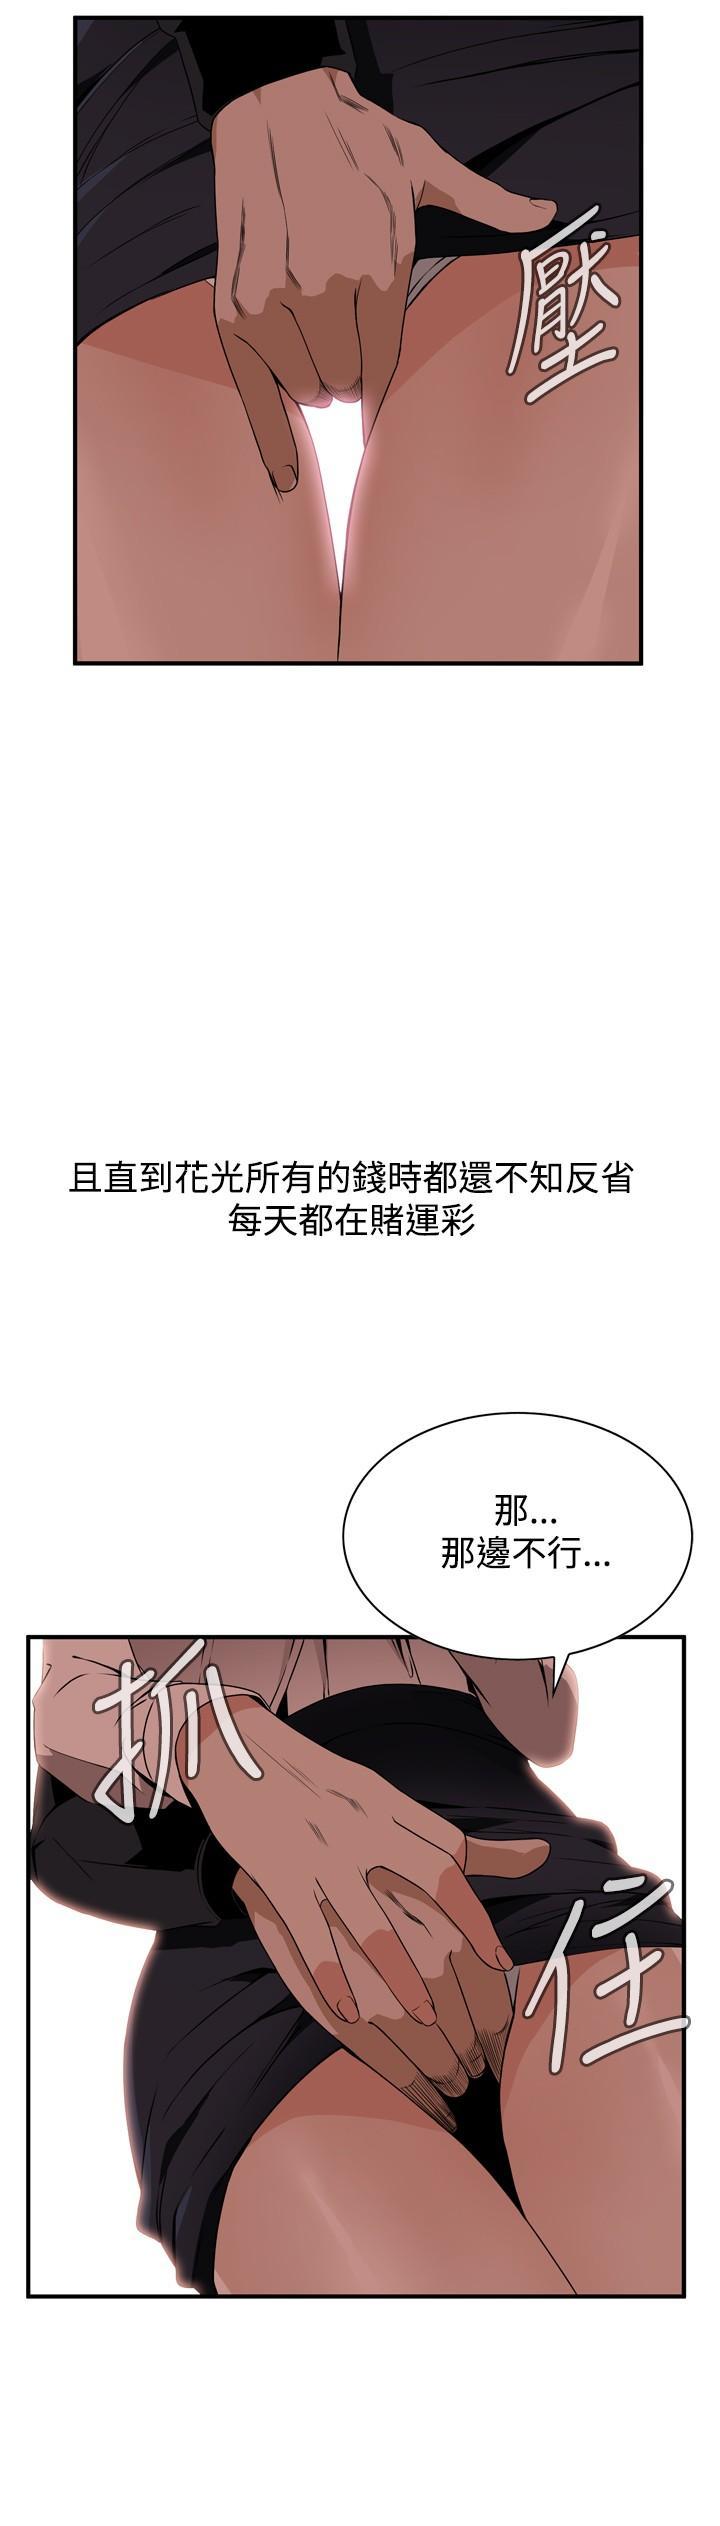 Take a Peek 偷窥 Ch.39~51 [Chinese]中文 38